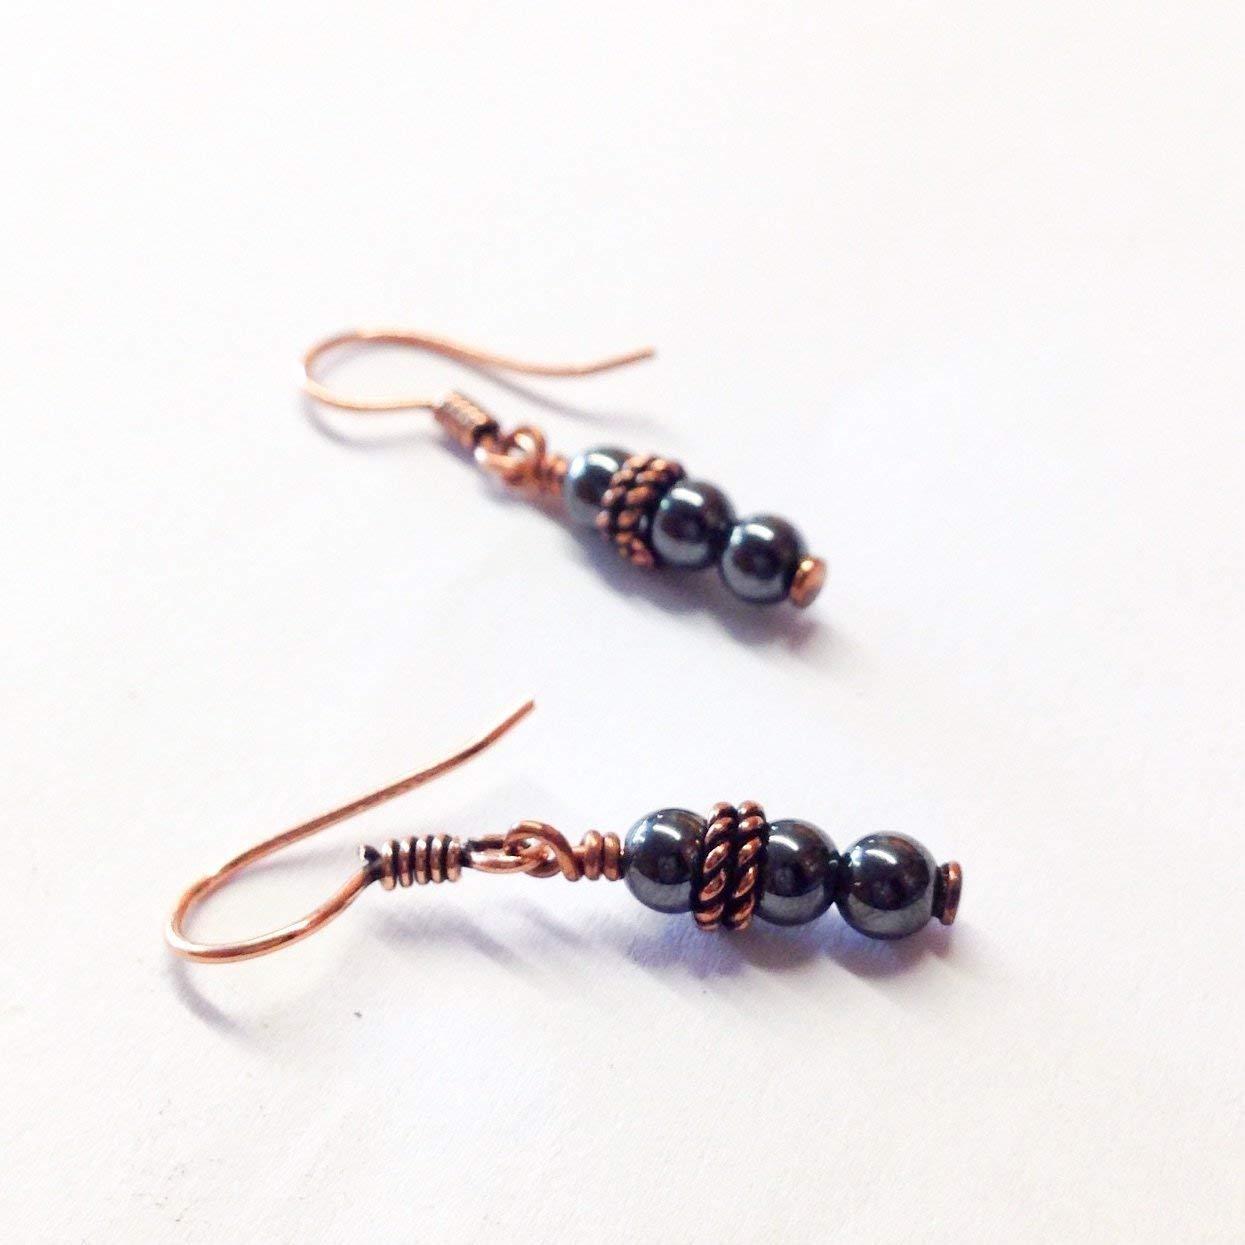 Hematite earrings, copper earrings, 7th anniversary gift, 11th anniversary gift, hematite anniversary, copper anniversary